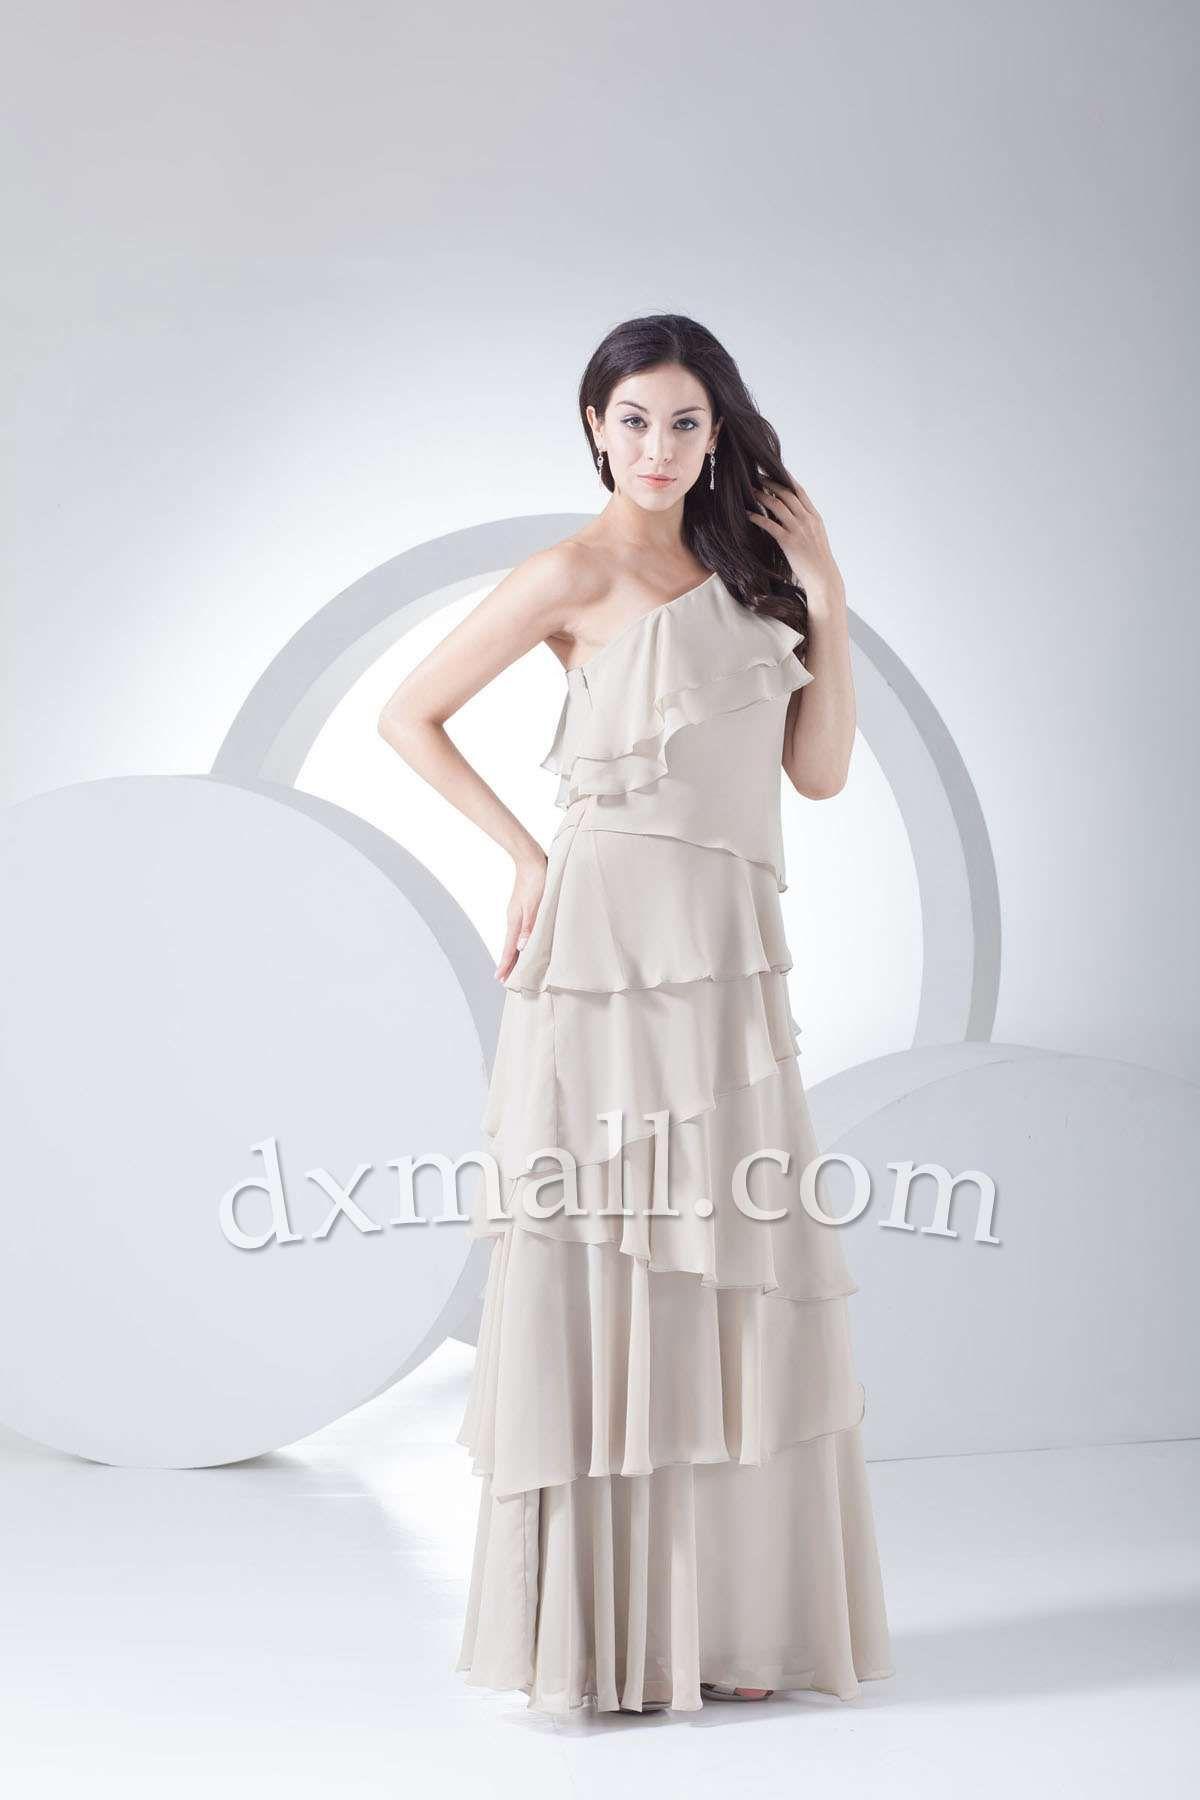 Sheath/Column Wedding Guest Dresses One Shoulder Floor Length Chiffon picture shown 130010400146